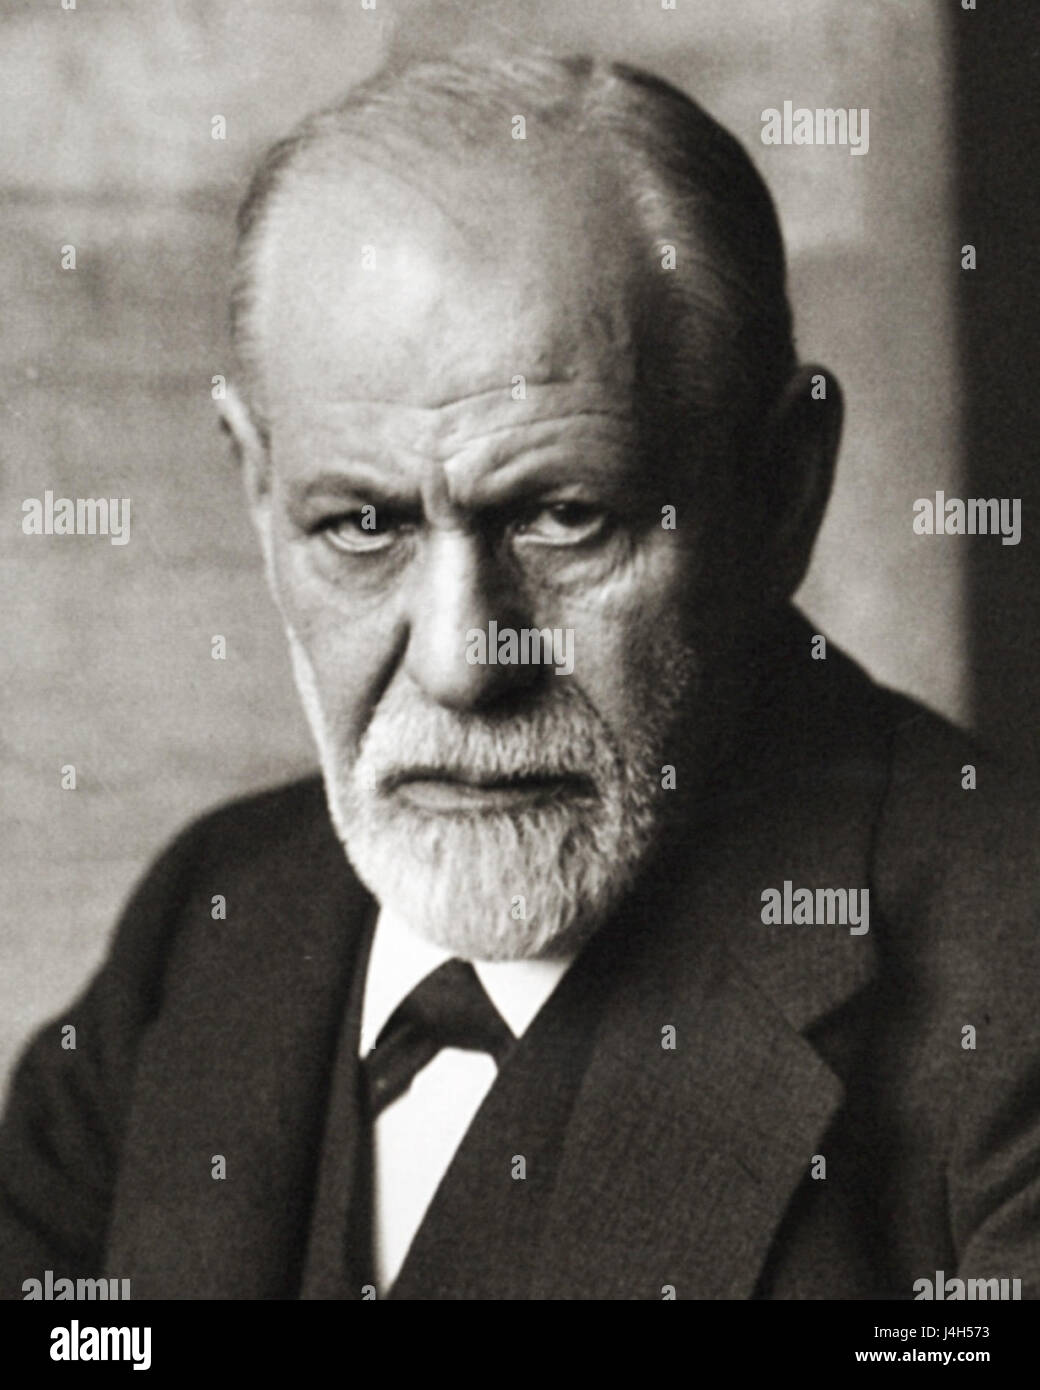 Sigmund Freud 1926 (cropped) - Stock Image